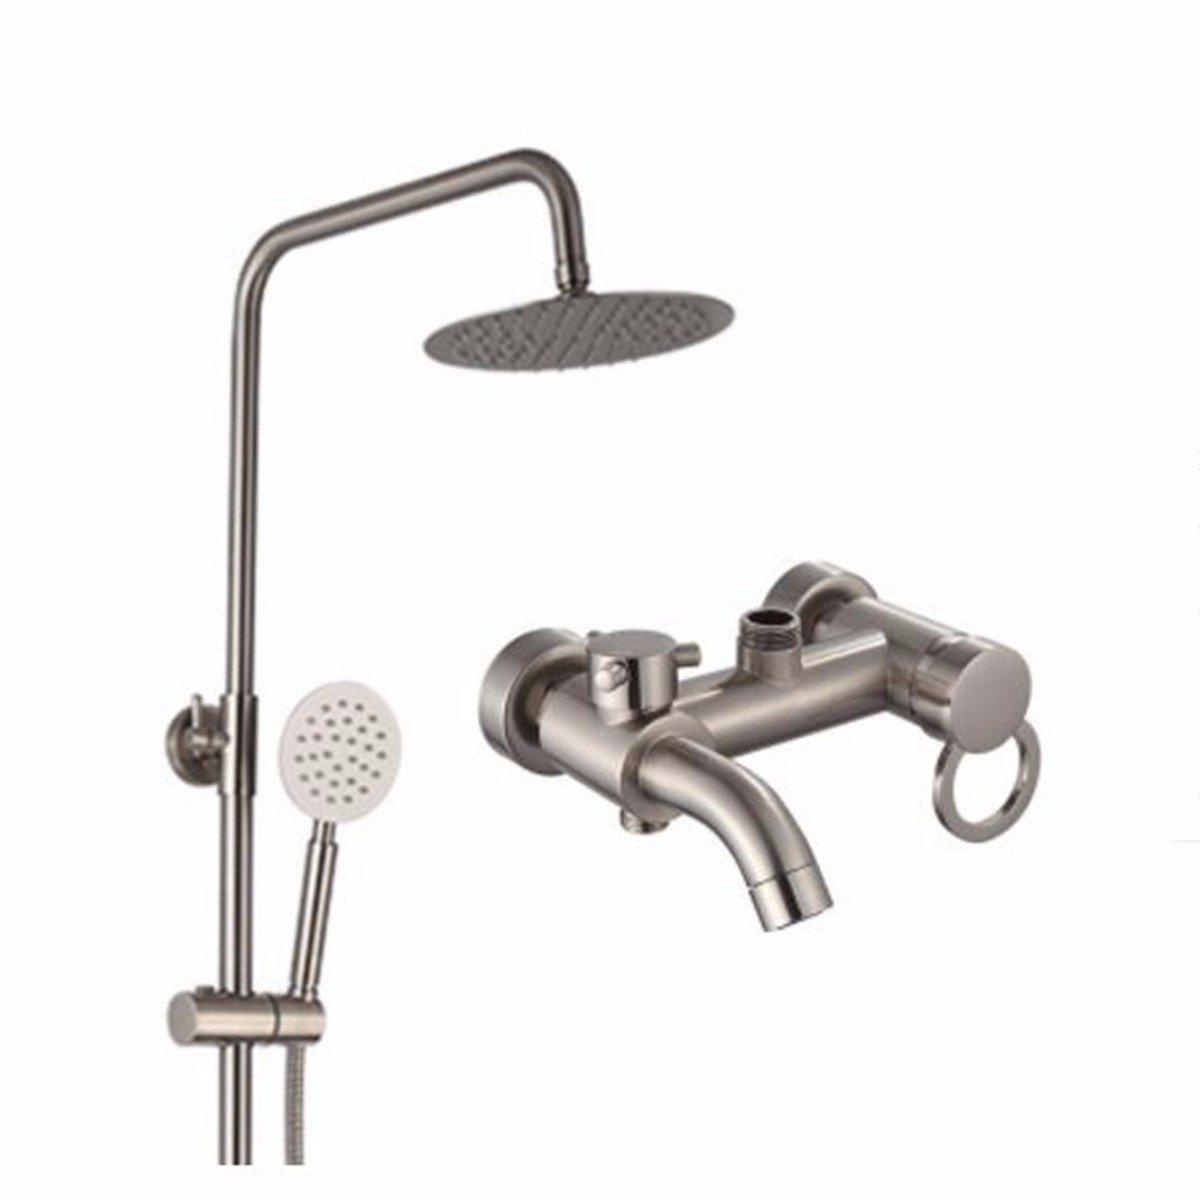 E Shower Copper Shower Hand Shower Simple Lift Shower Set Continental Pull Faucet Brass Shower,G